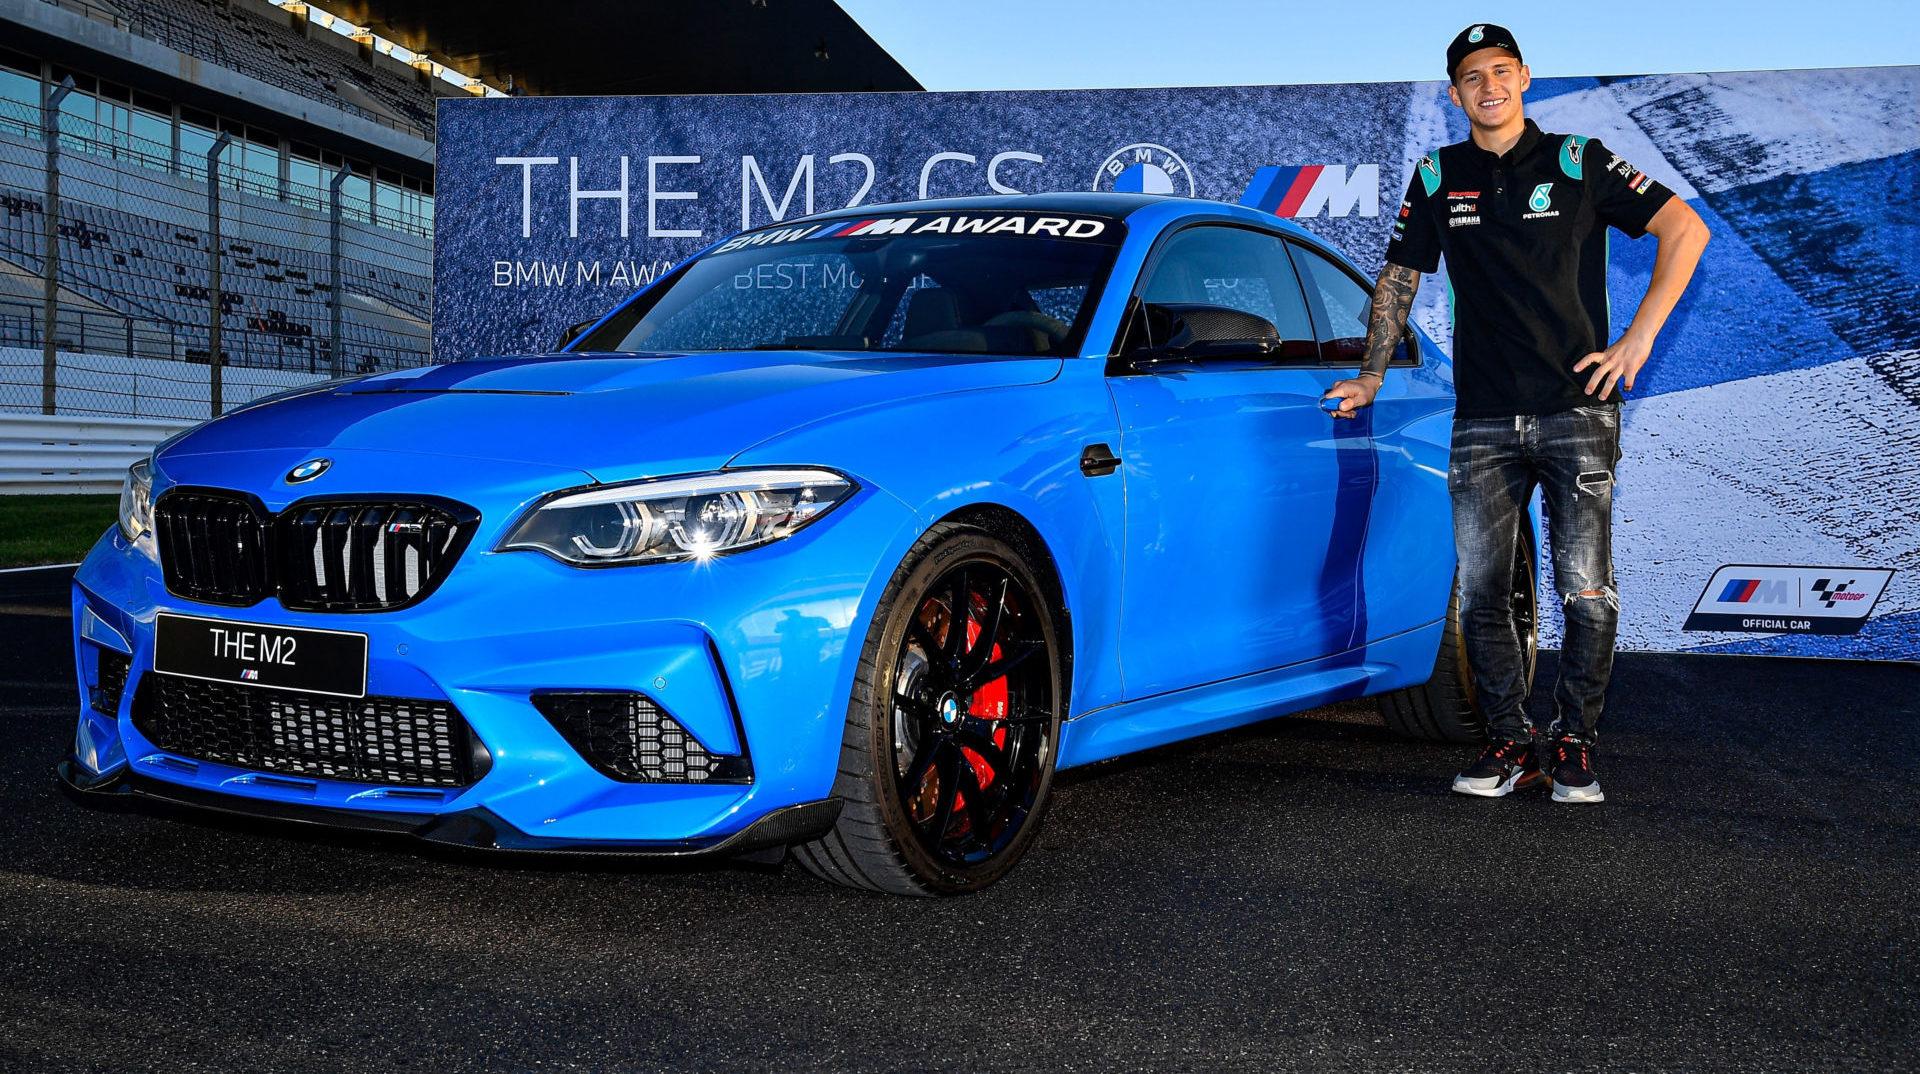 Fabio Quartararo with his new BMW M2 CS. Photo courtesy Dorna.